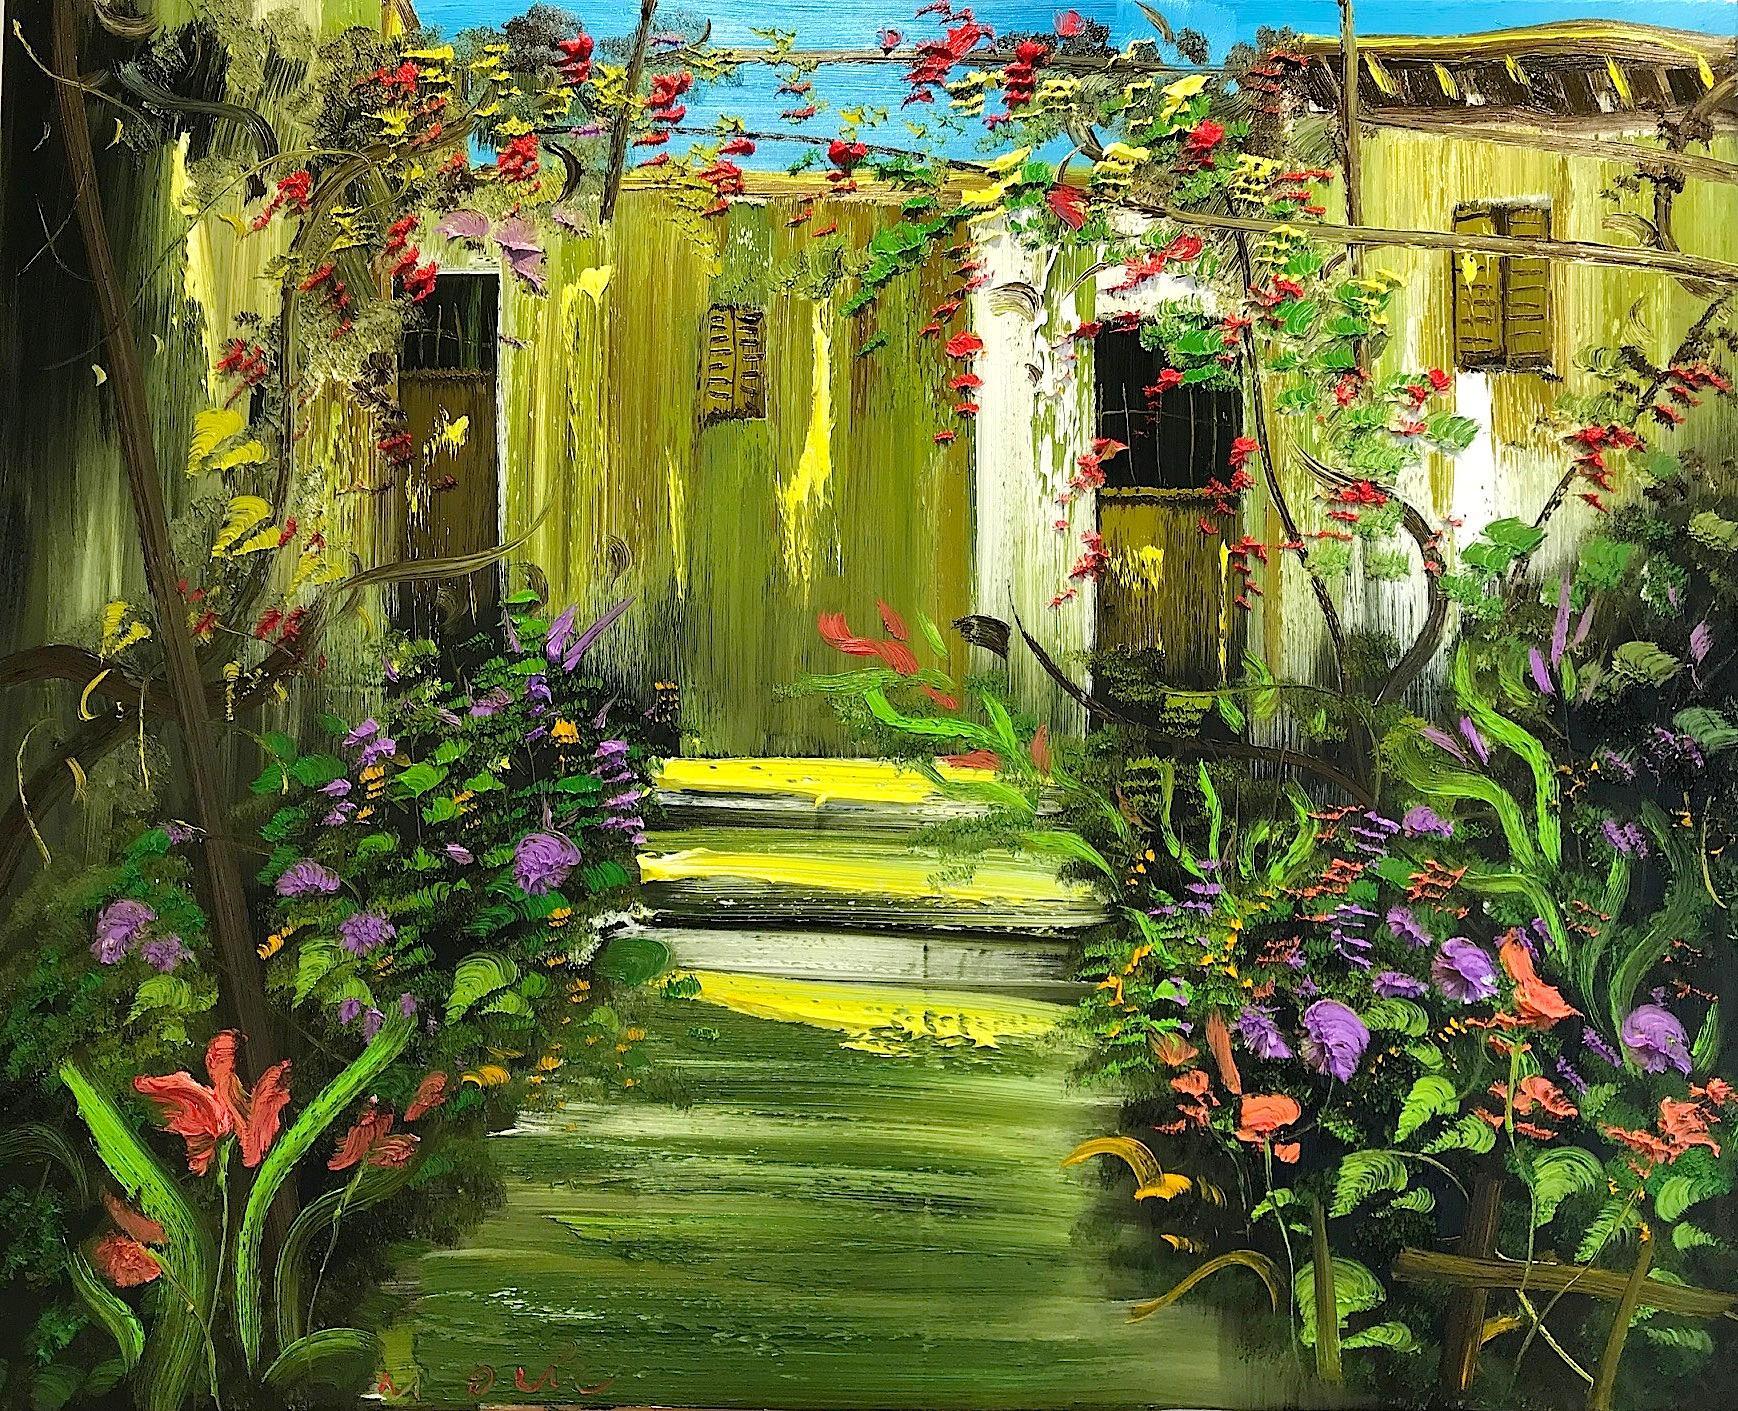 31.Backyard garden 120x150 cm - Le Minh Duc - Luxembourg Art